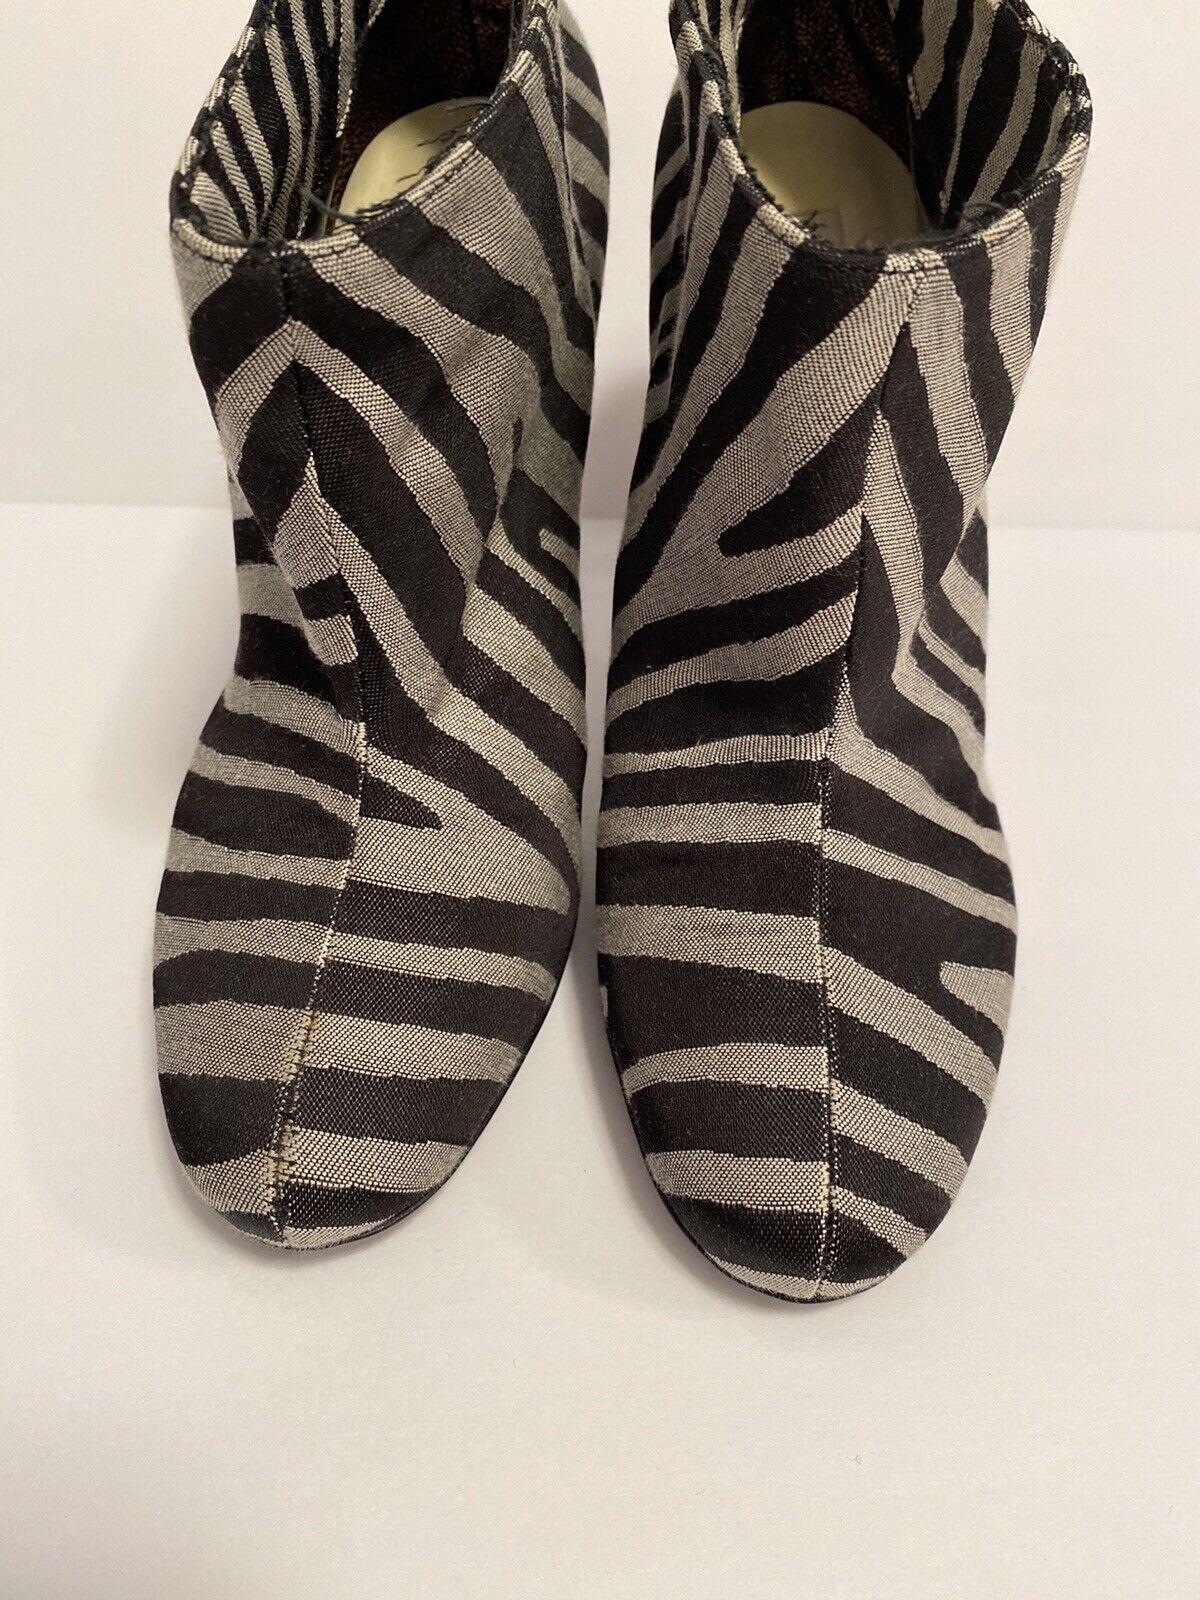 Stella McCartney Zebra Striped Boots Size 36 - image 3